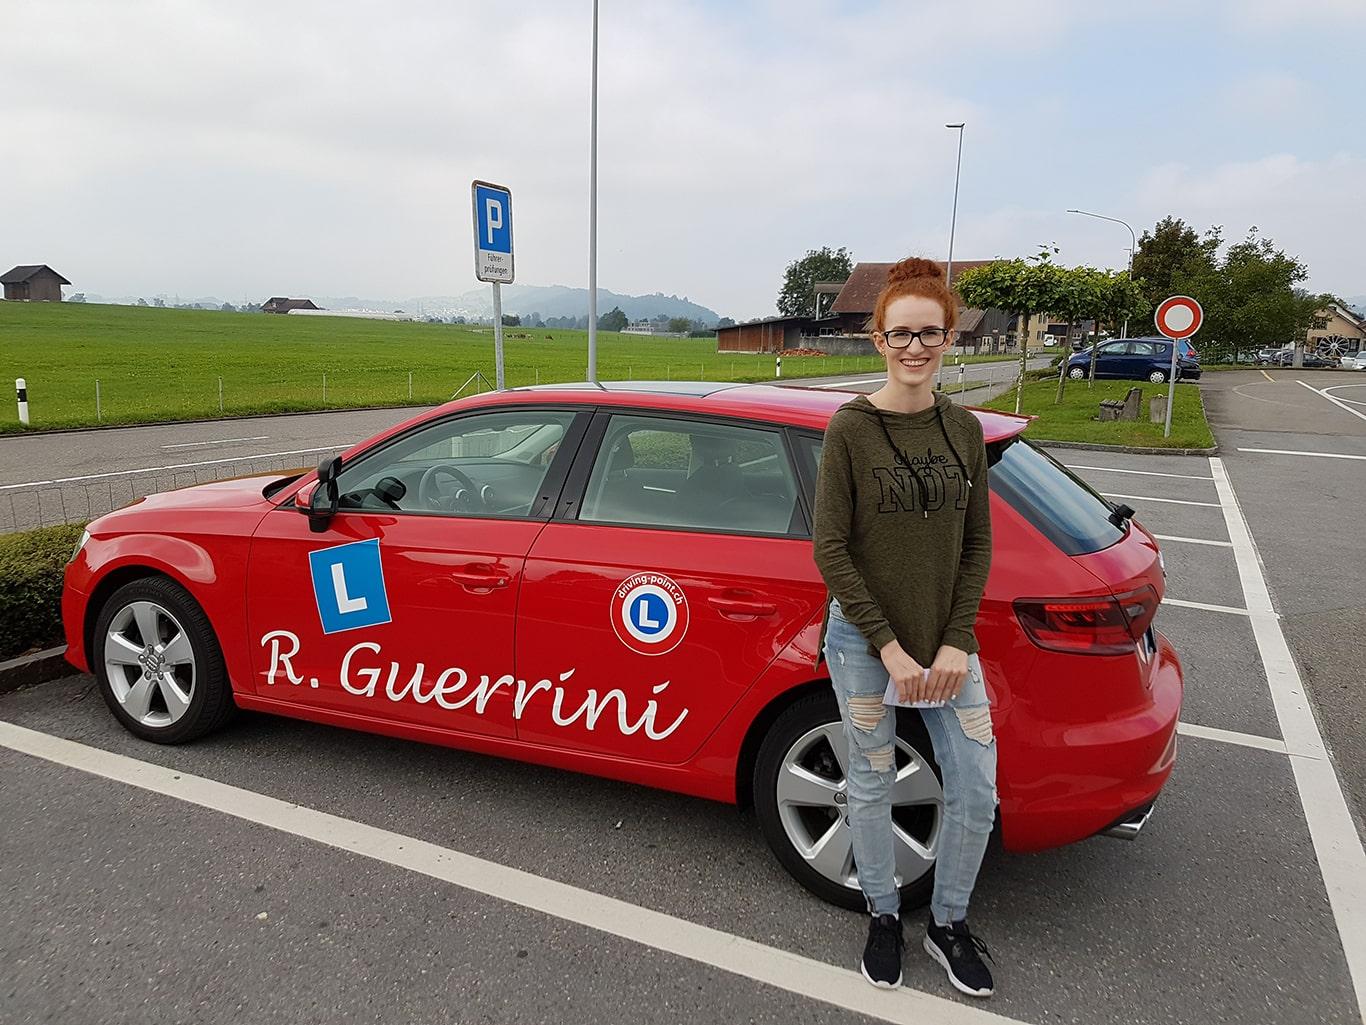 Verkehrskunde lernen & Motorrad Grundkurs belegen in Rapperswil - Fahrschule Driving Point